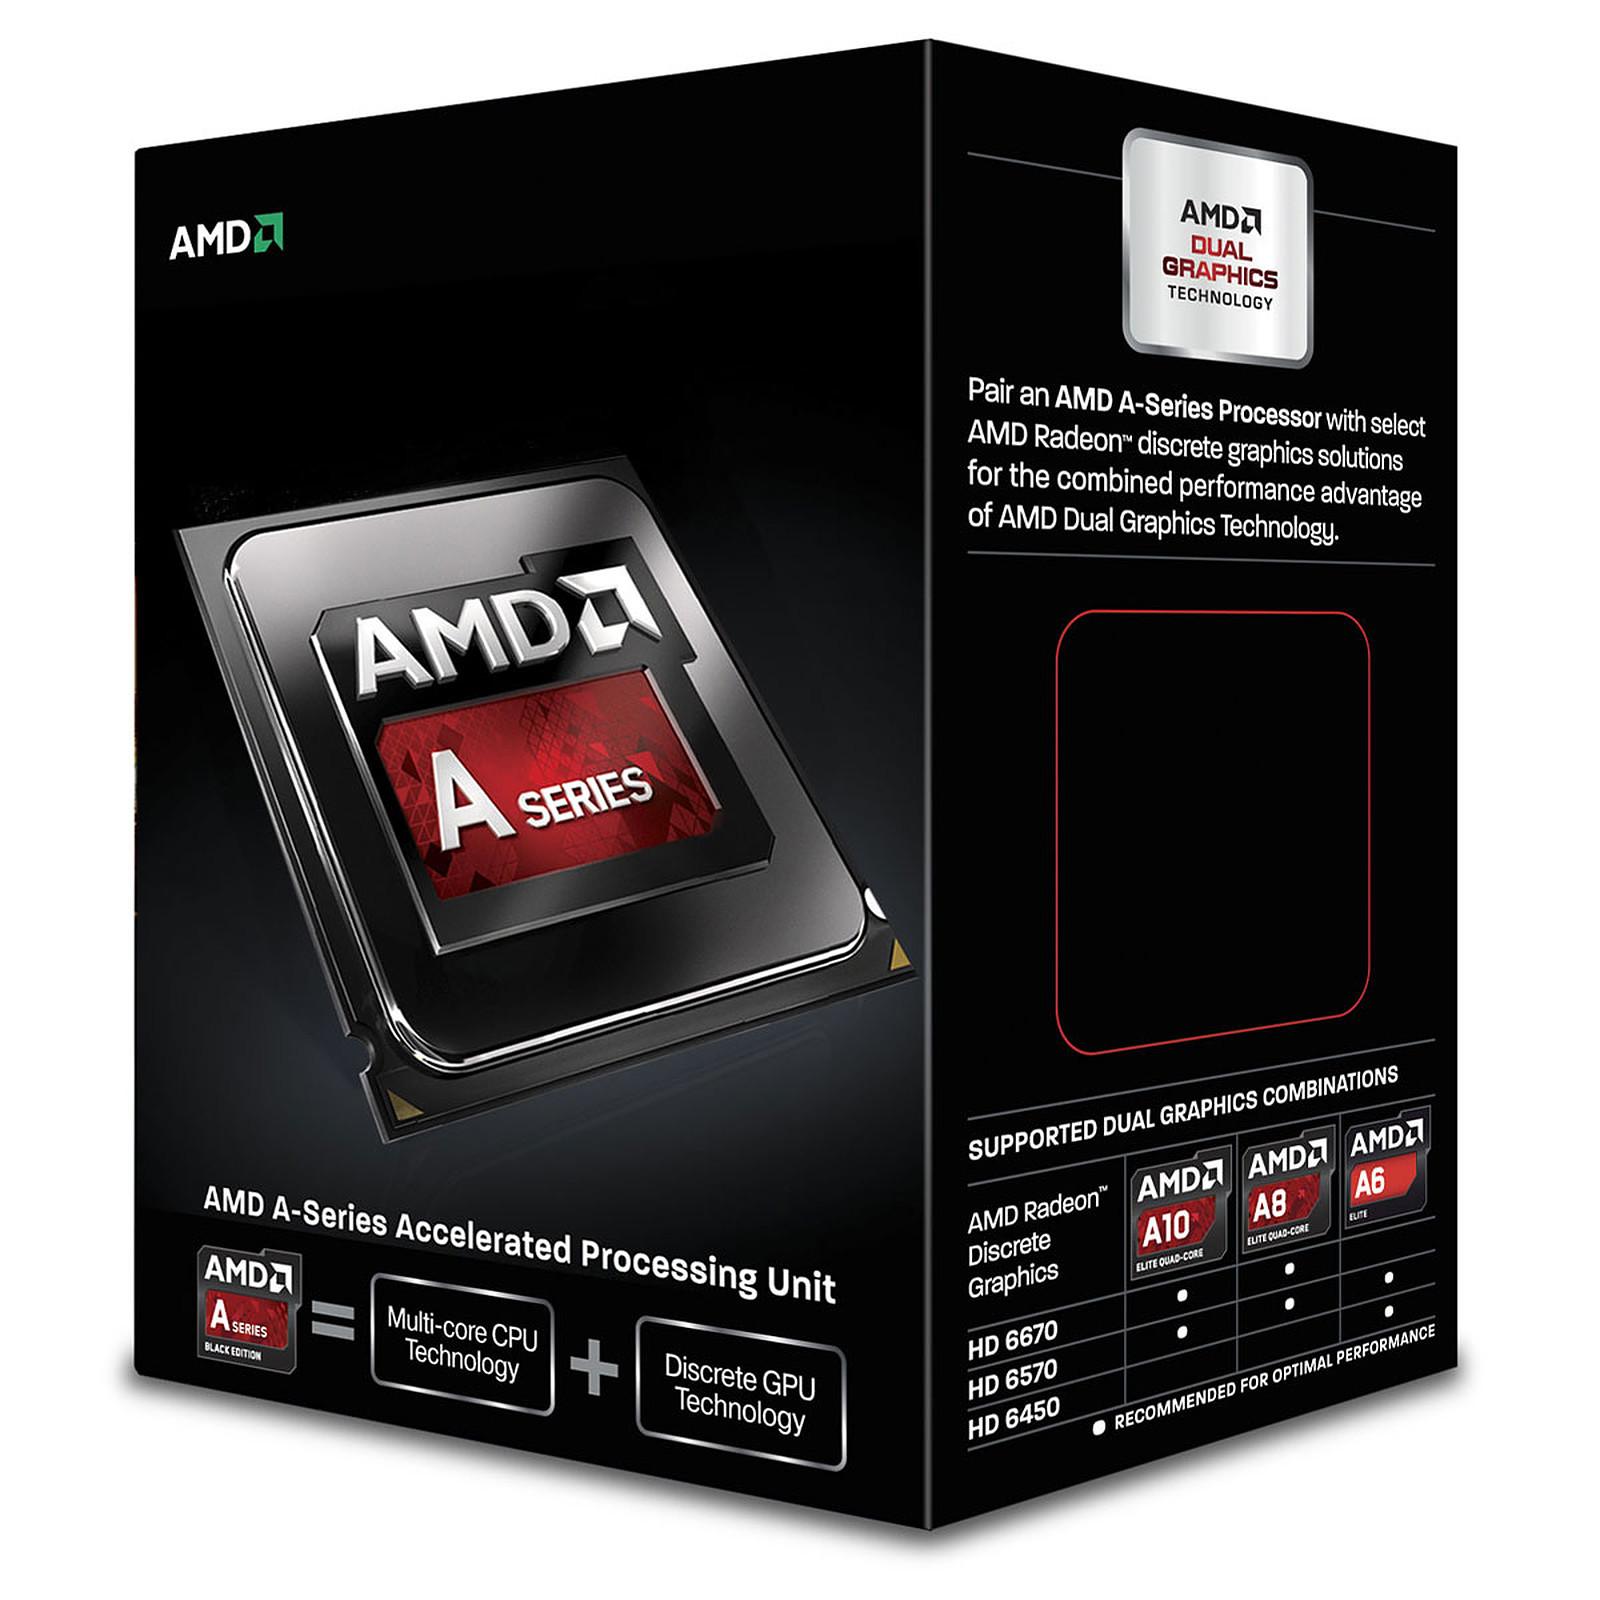 AMD A6-7400K (3.5 GHz)